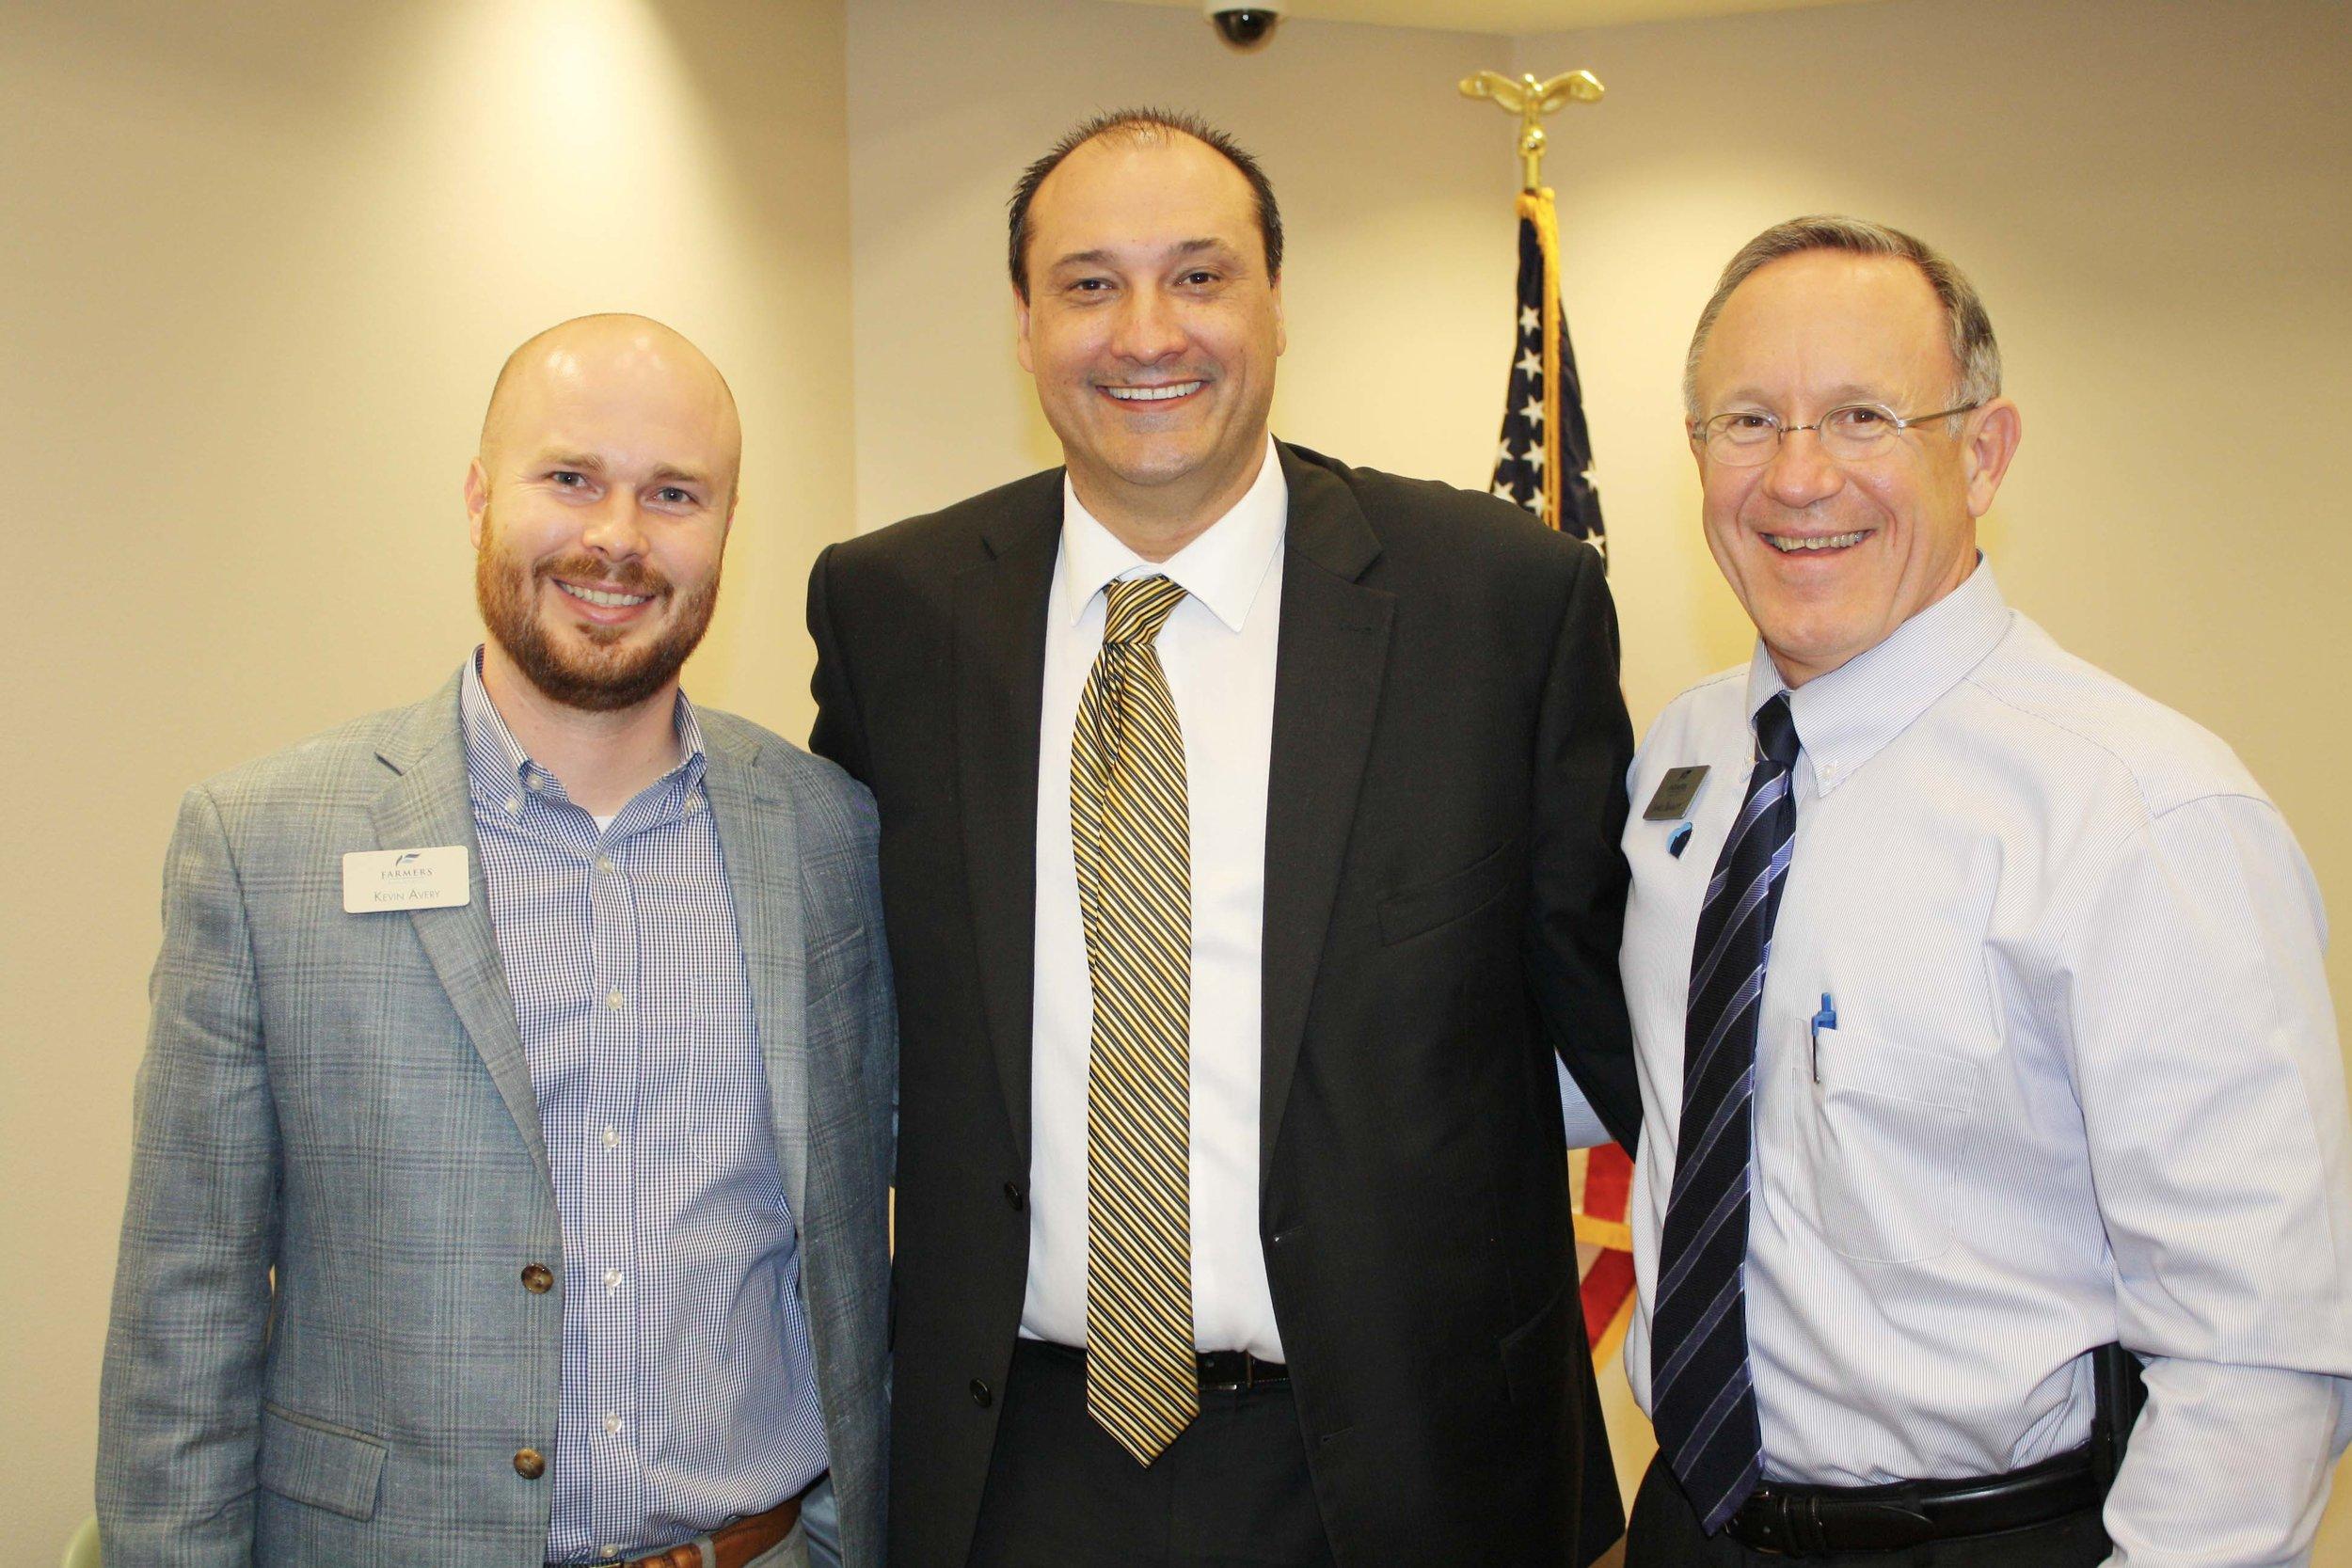 Kevin Avery, Dr. Jason Smith and James Bramlett